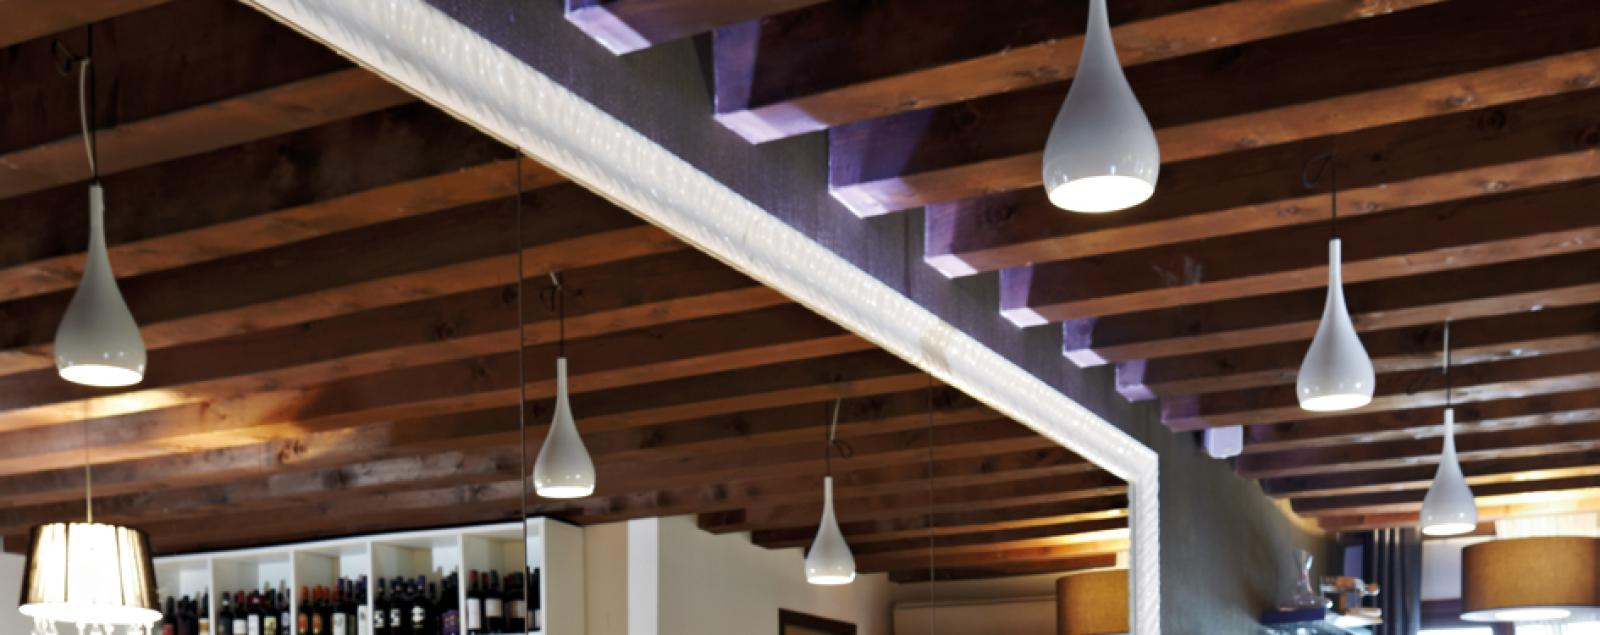 bar lighting pendant lamps and applique fabbian